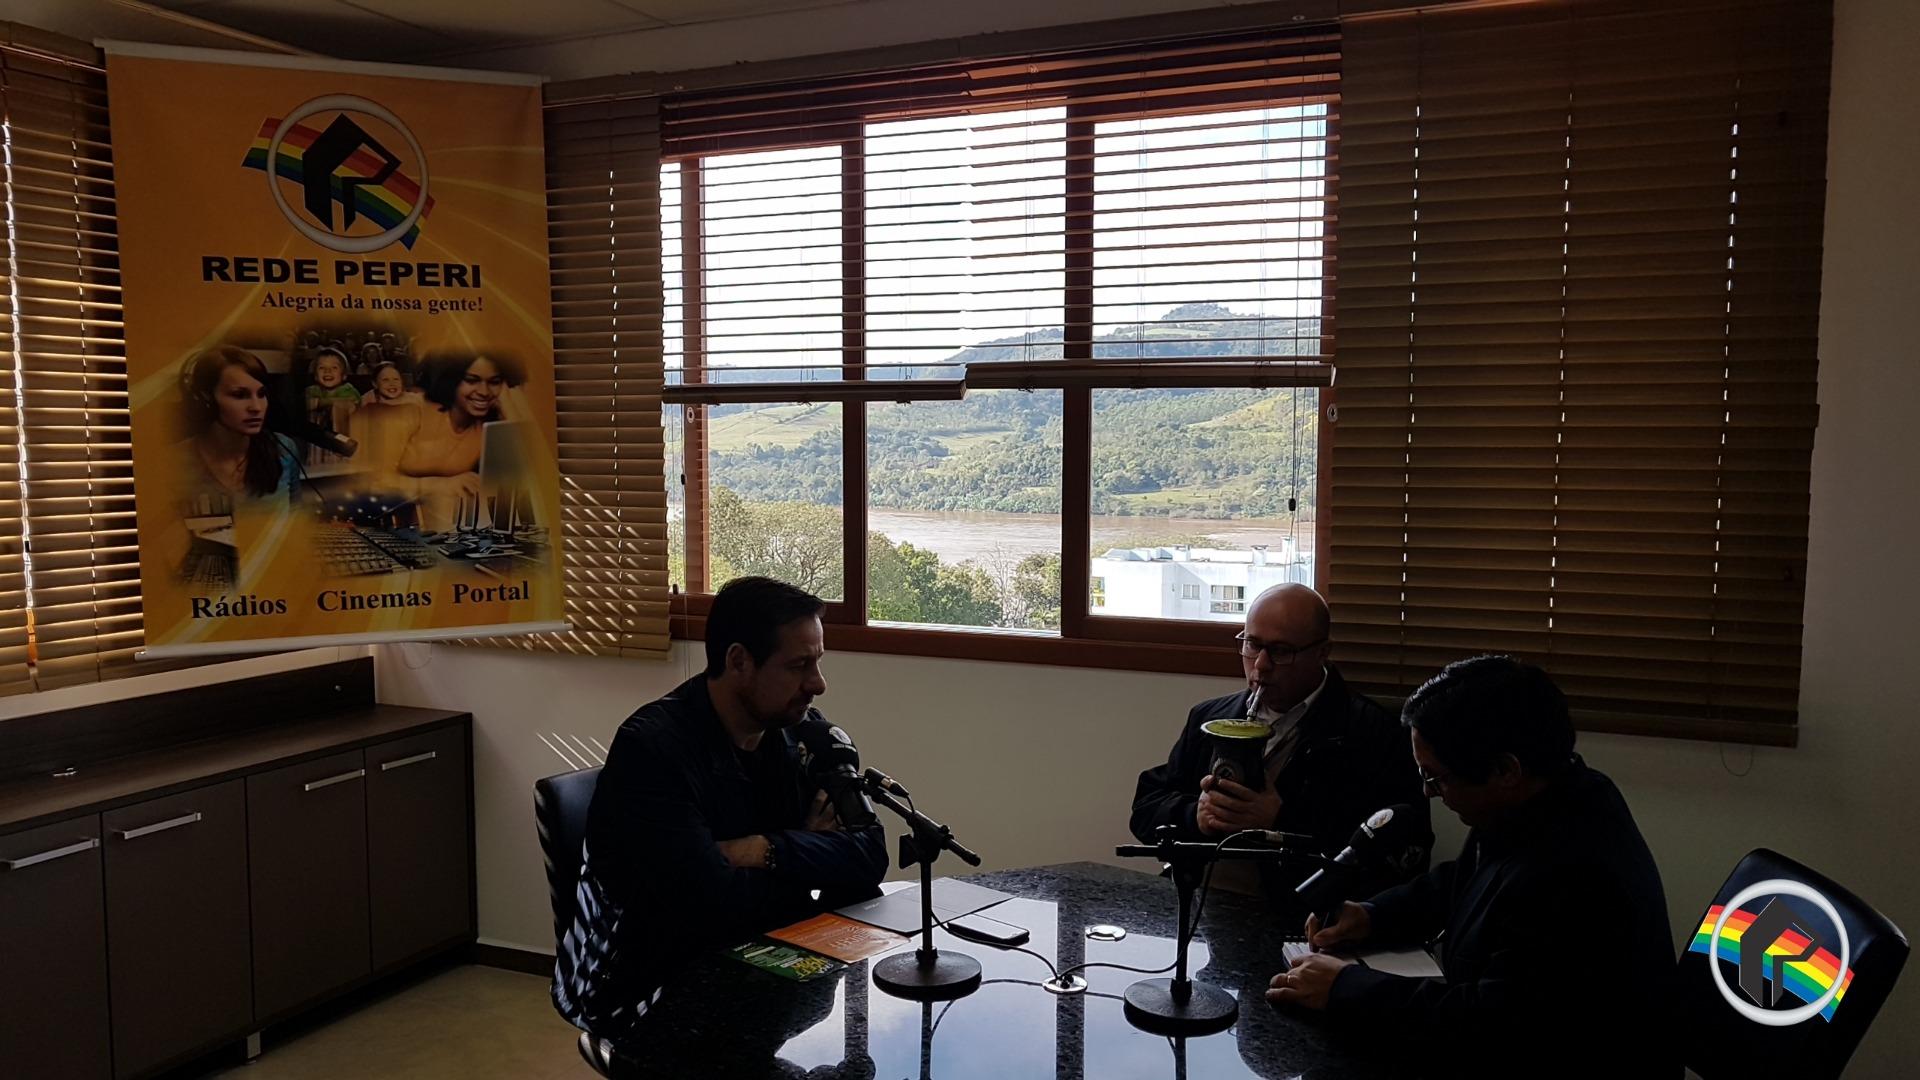 Reitor da Uceff visita novas instalações da Rádio Itapiranga